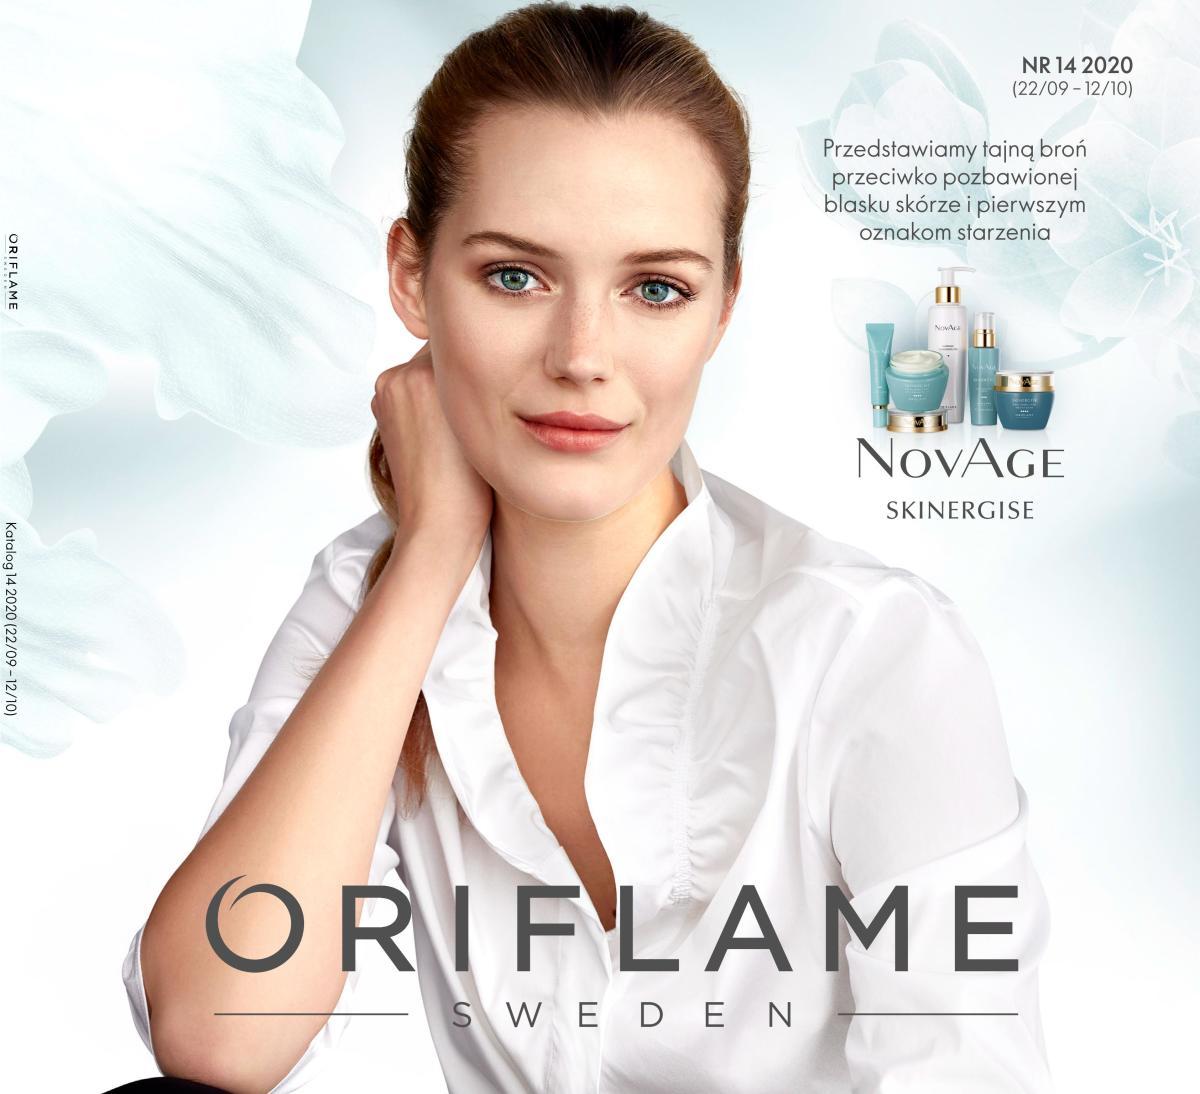 Gazetka Oriflame - Katalog nr 14-2020